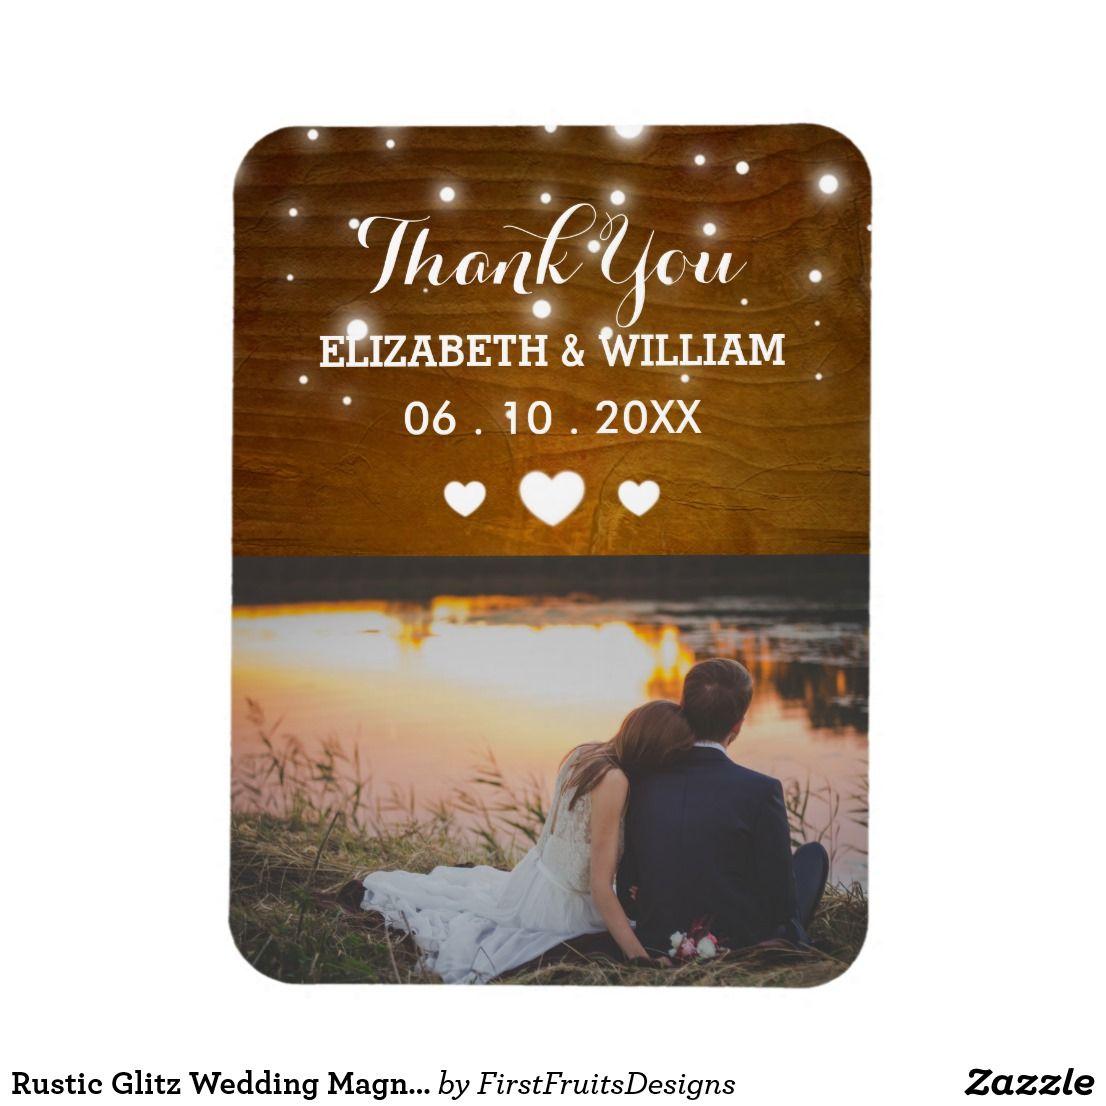 Rustic Glitz Wedding Magnet Favor Photo Thank You Glitz Wedding